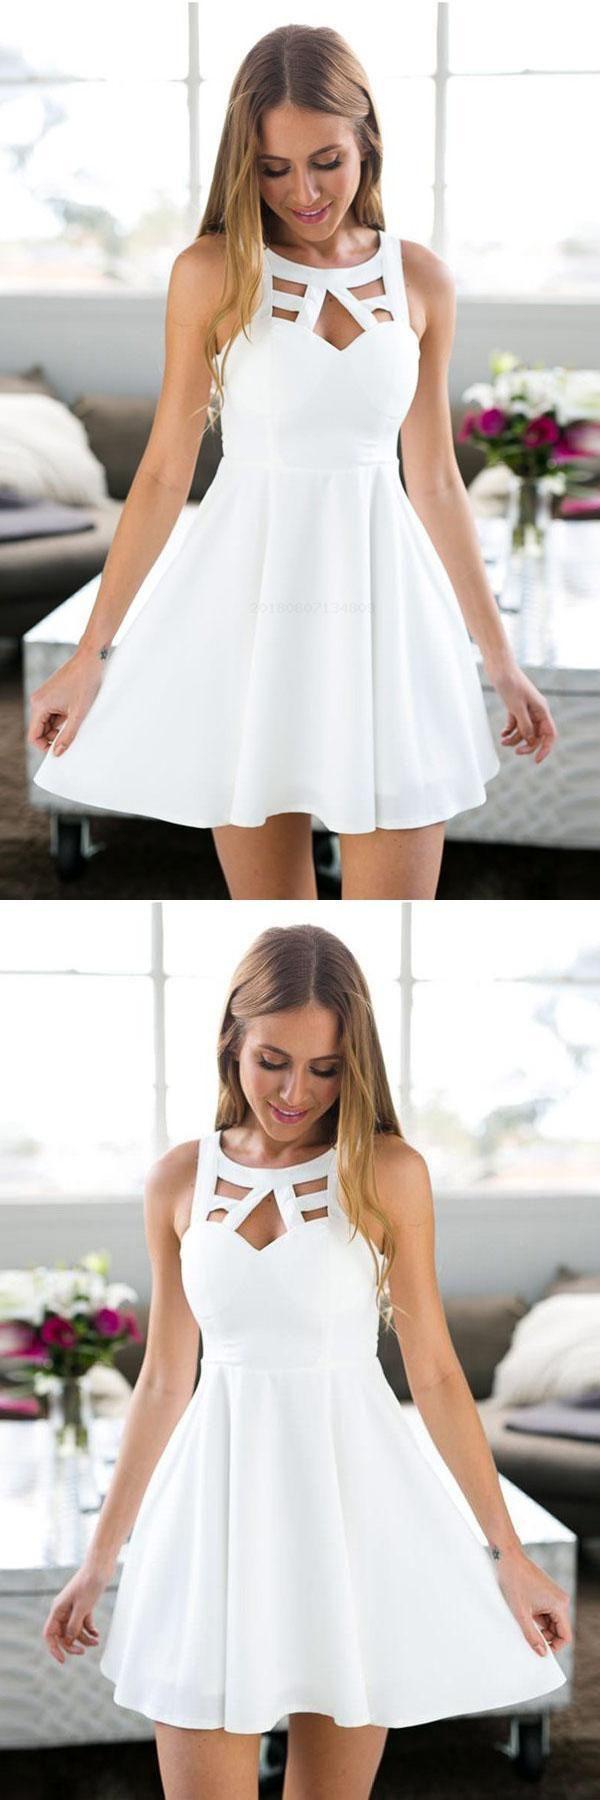 Short prom dresses white prom dresses homecoming dress white